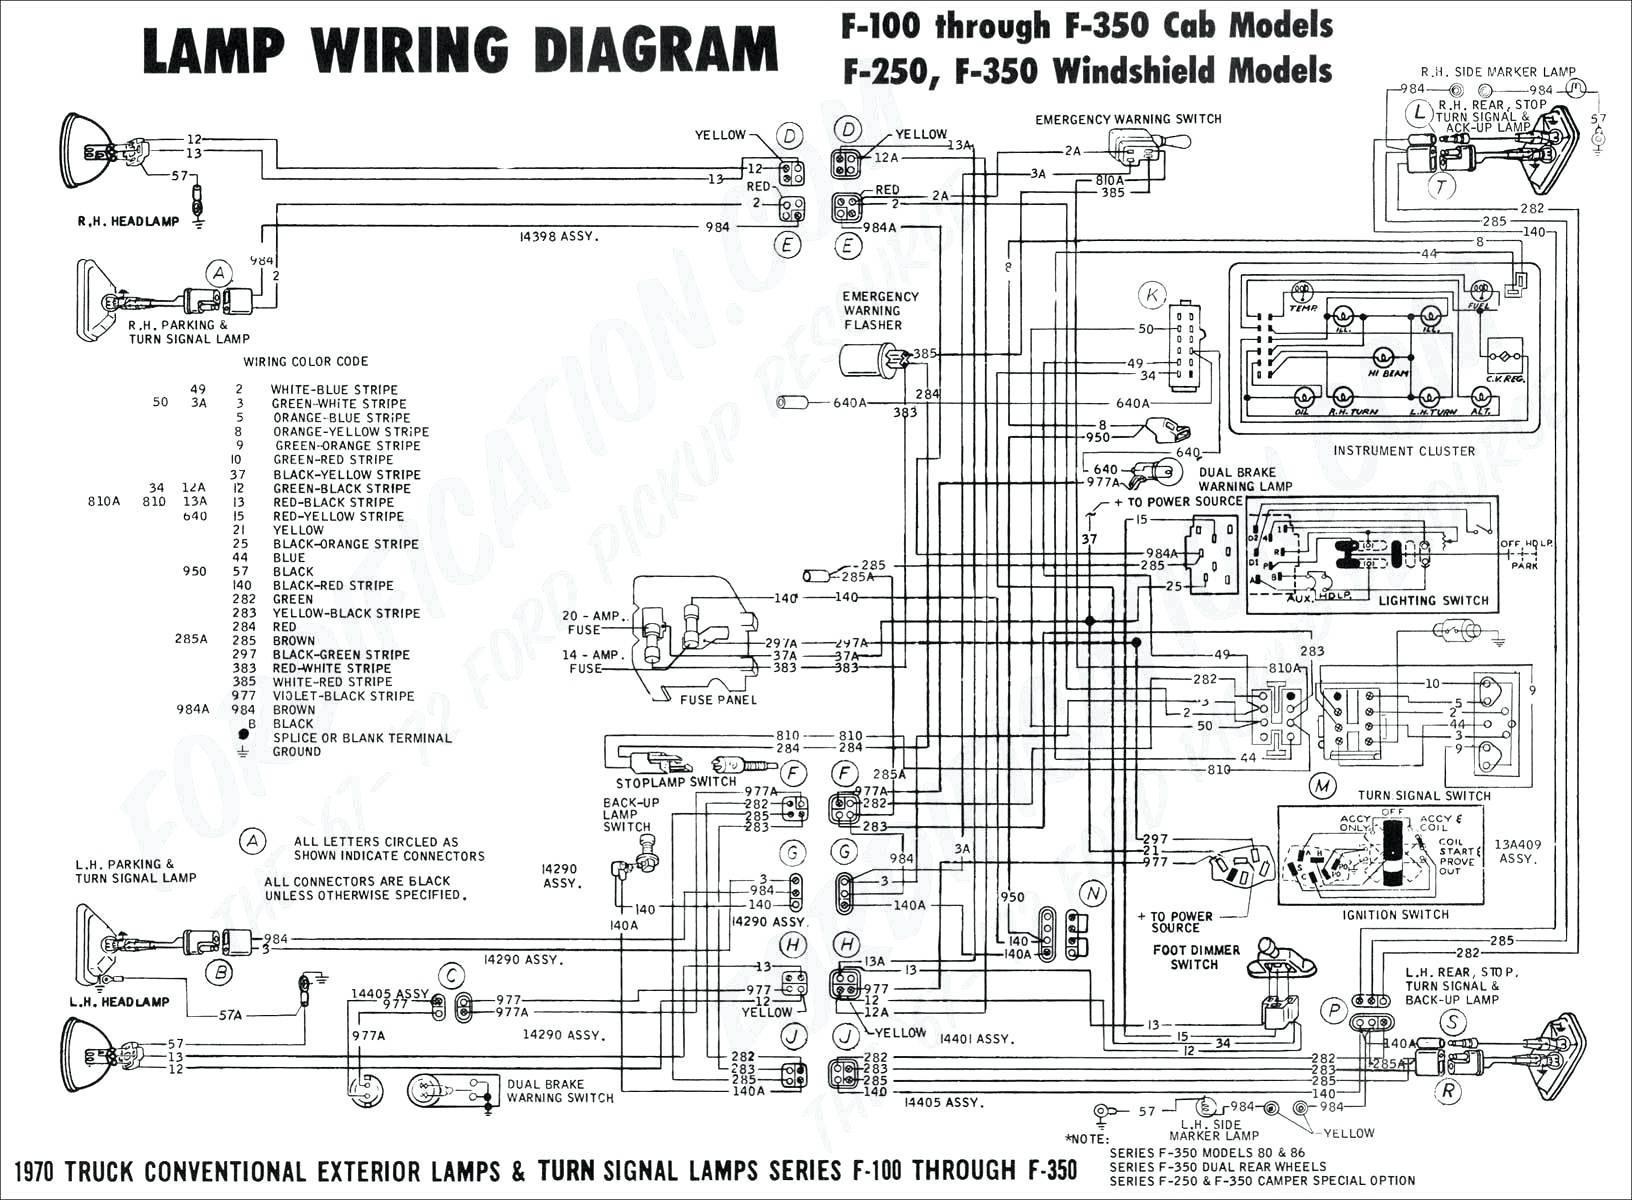 EK_4998] Honda Cbr1000Rr Wiring Diagram On Wiring Diagram 2003 Honda Cbr 600